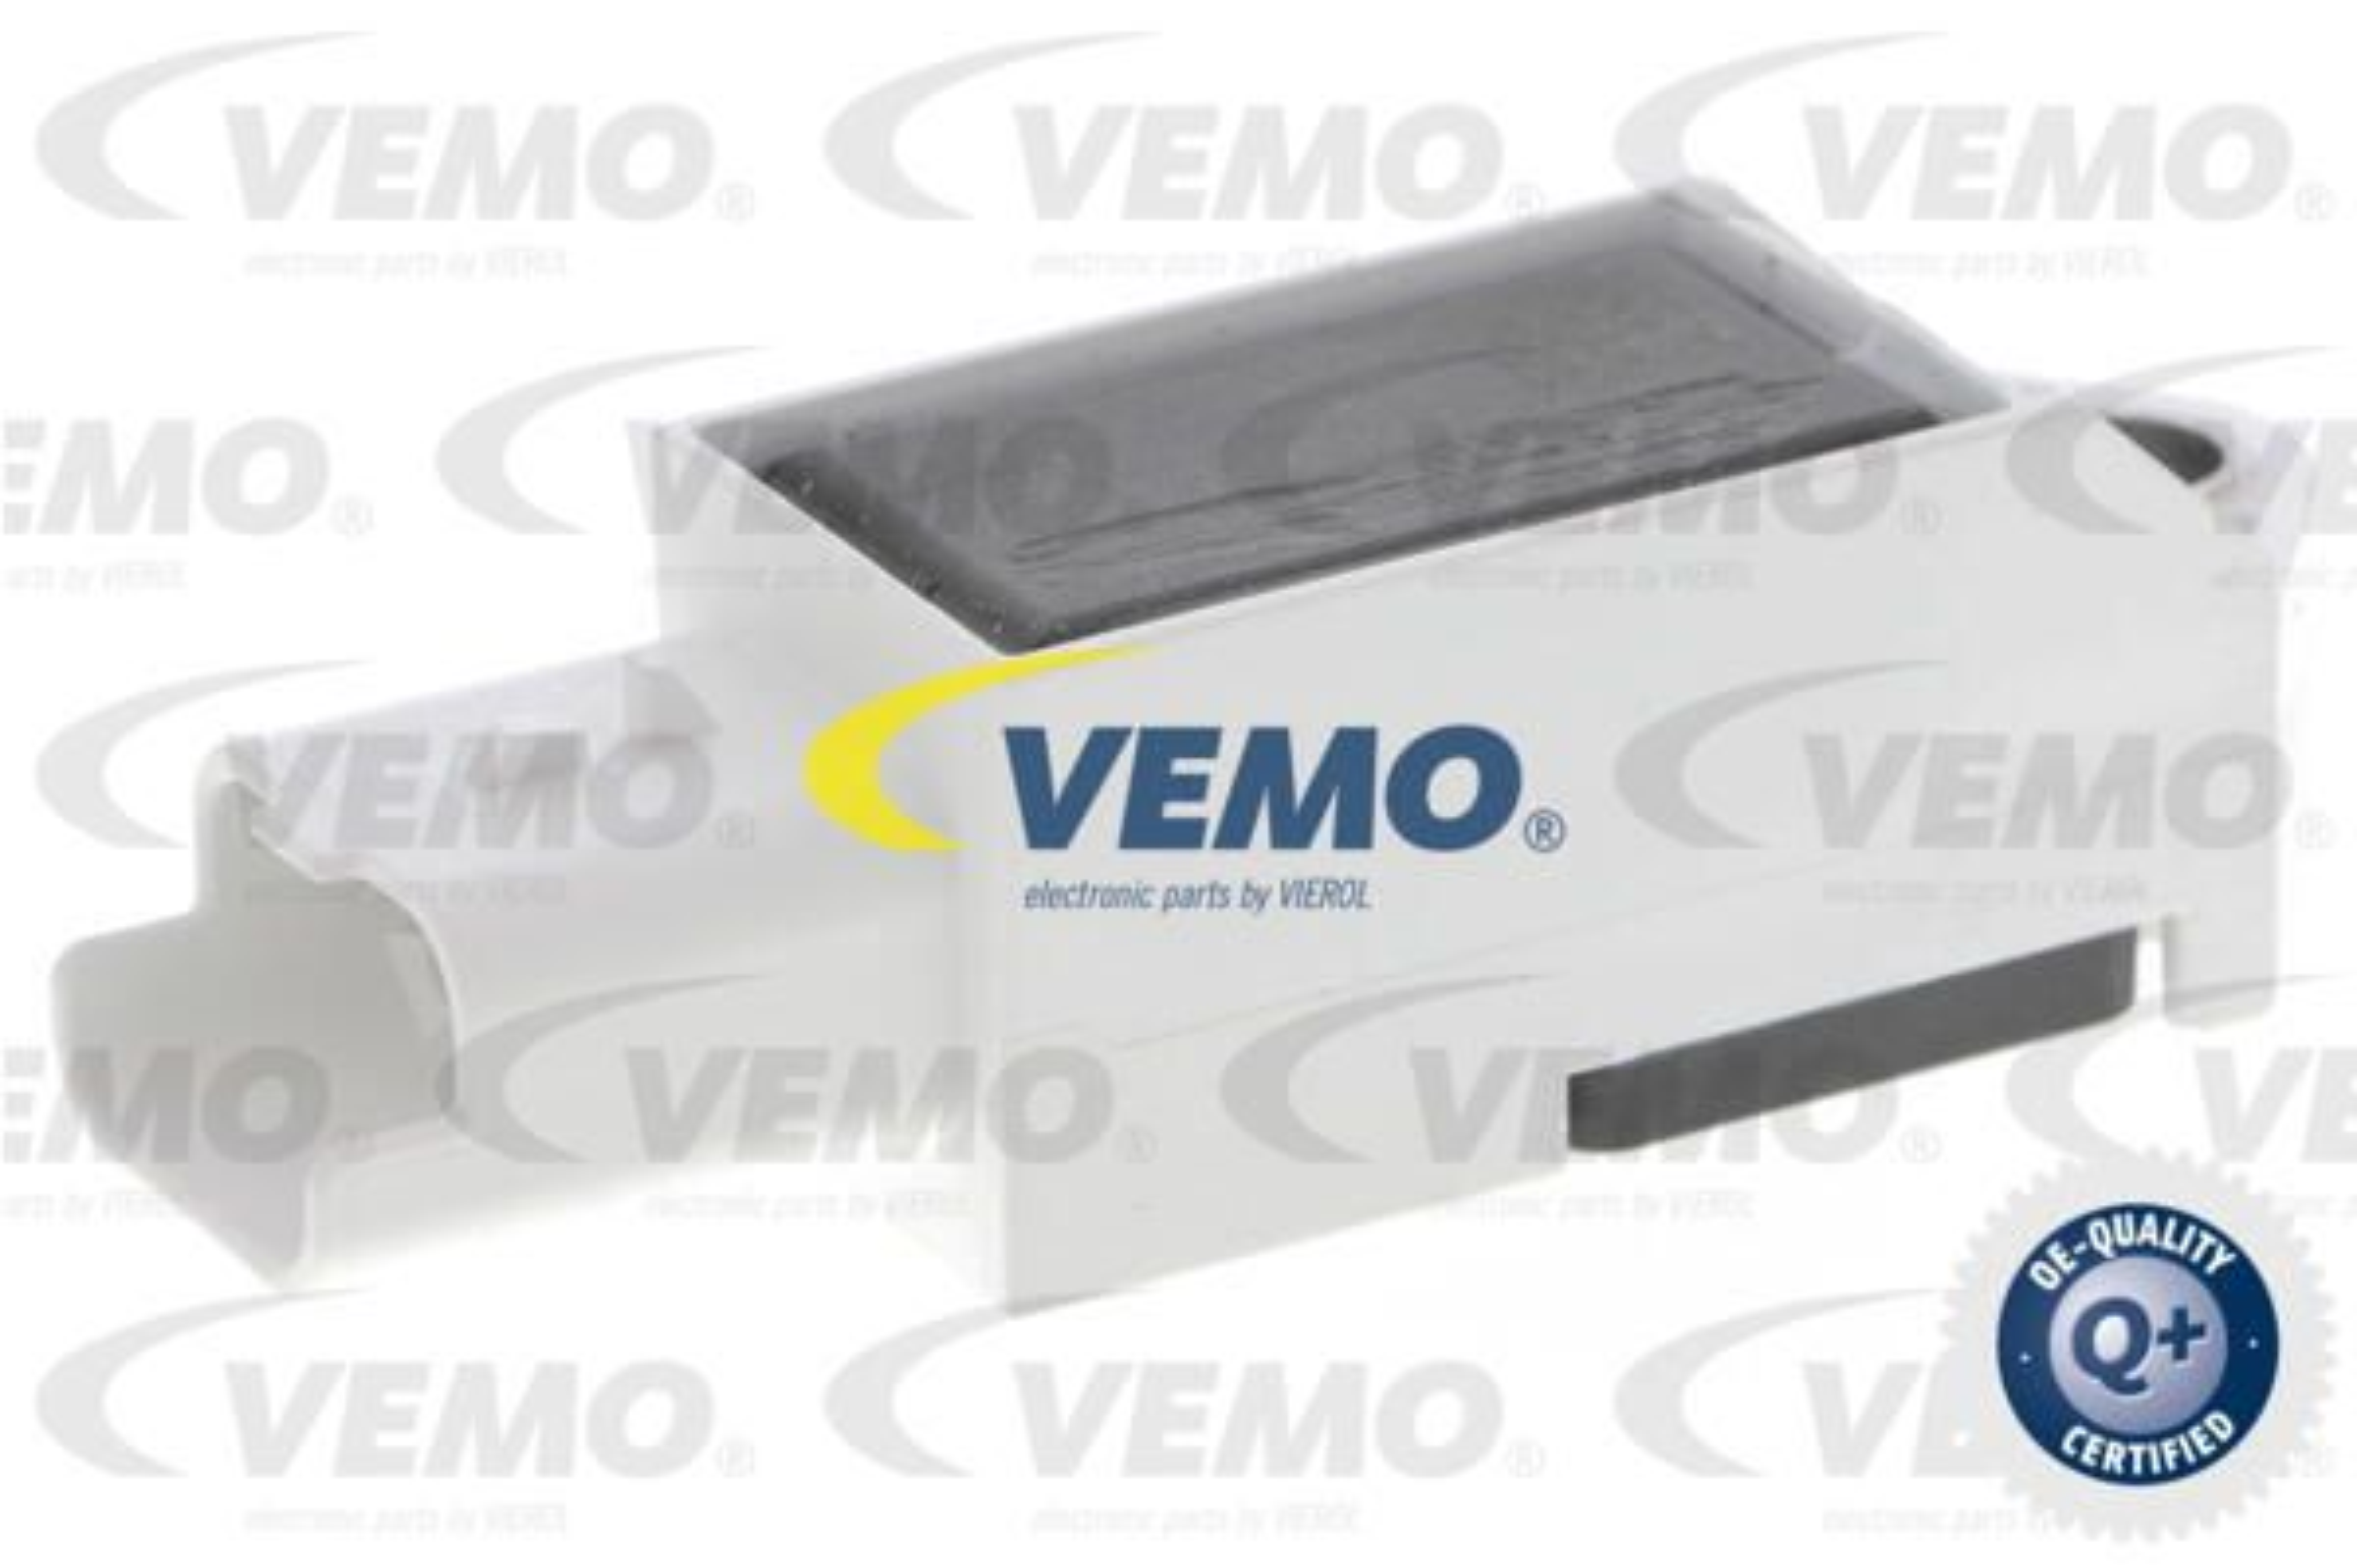 RENAULT SANDERO / STEPWAY 2021 Abgasdrucksensor - Original VEMO V30-72-0825 Pol-Anzahl: 3-polig